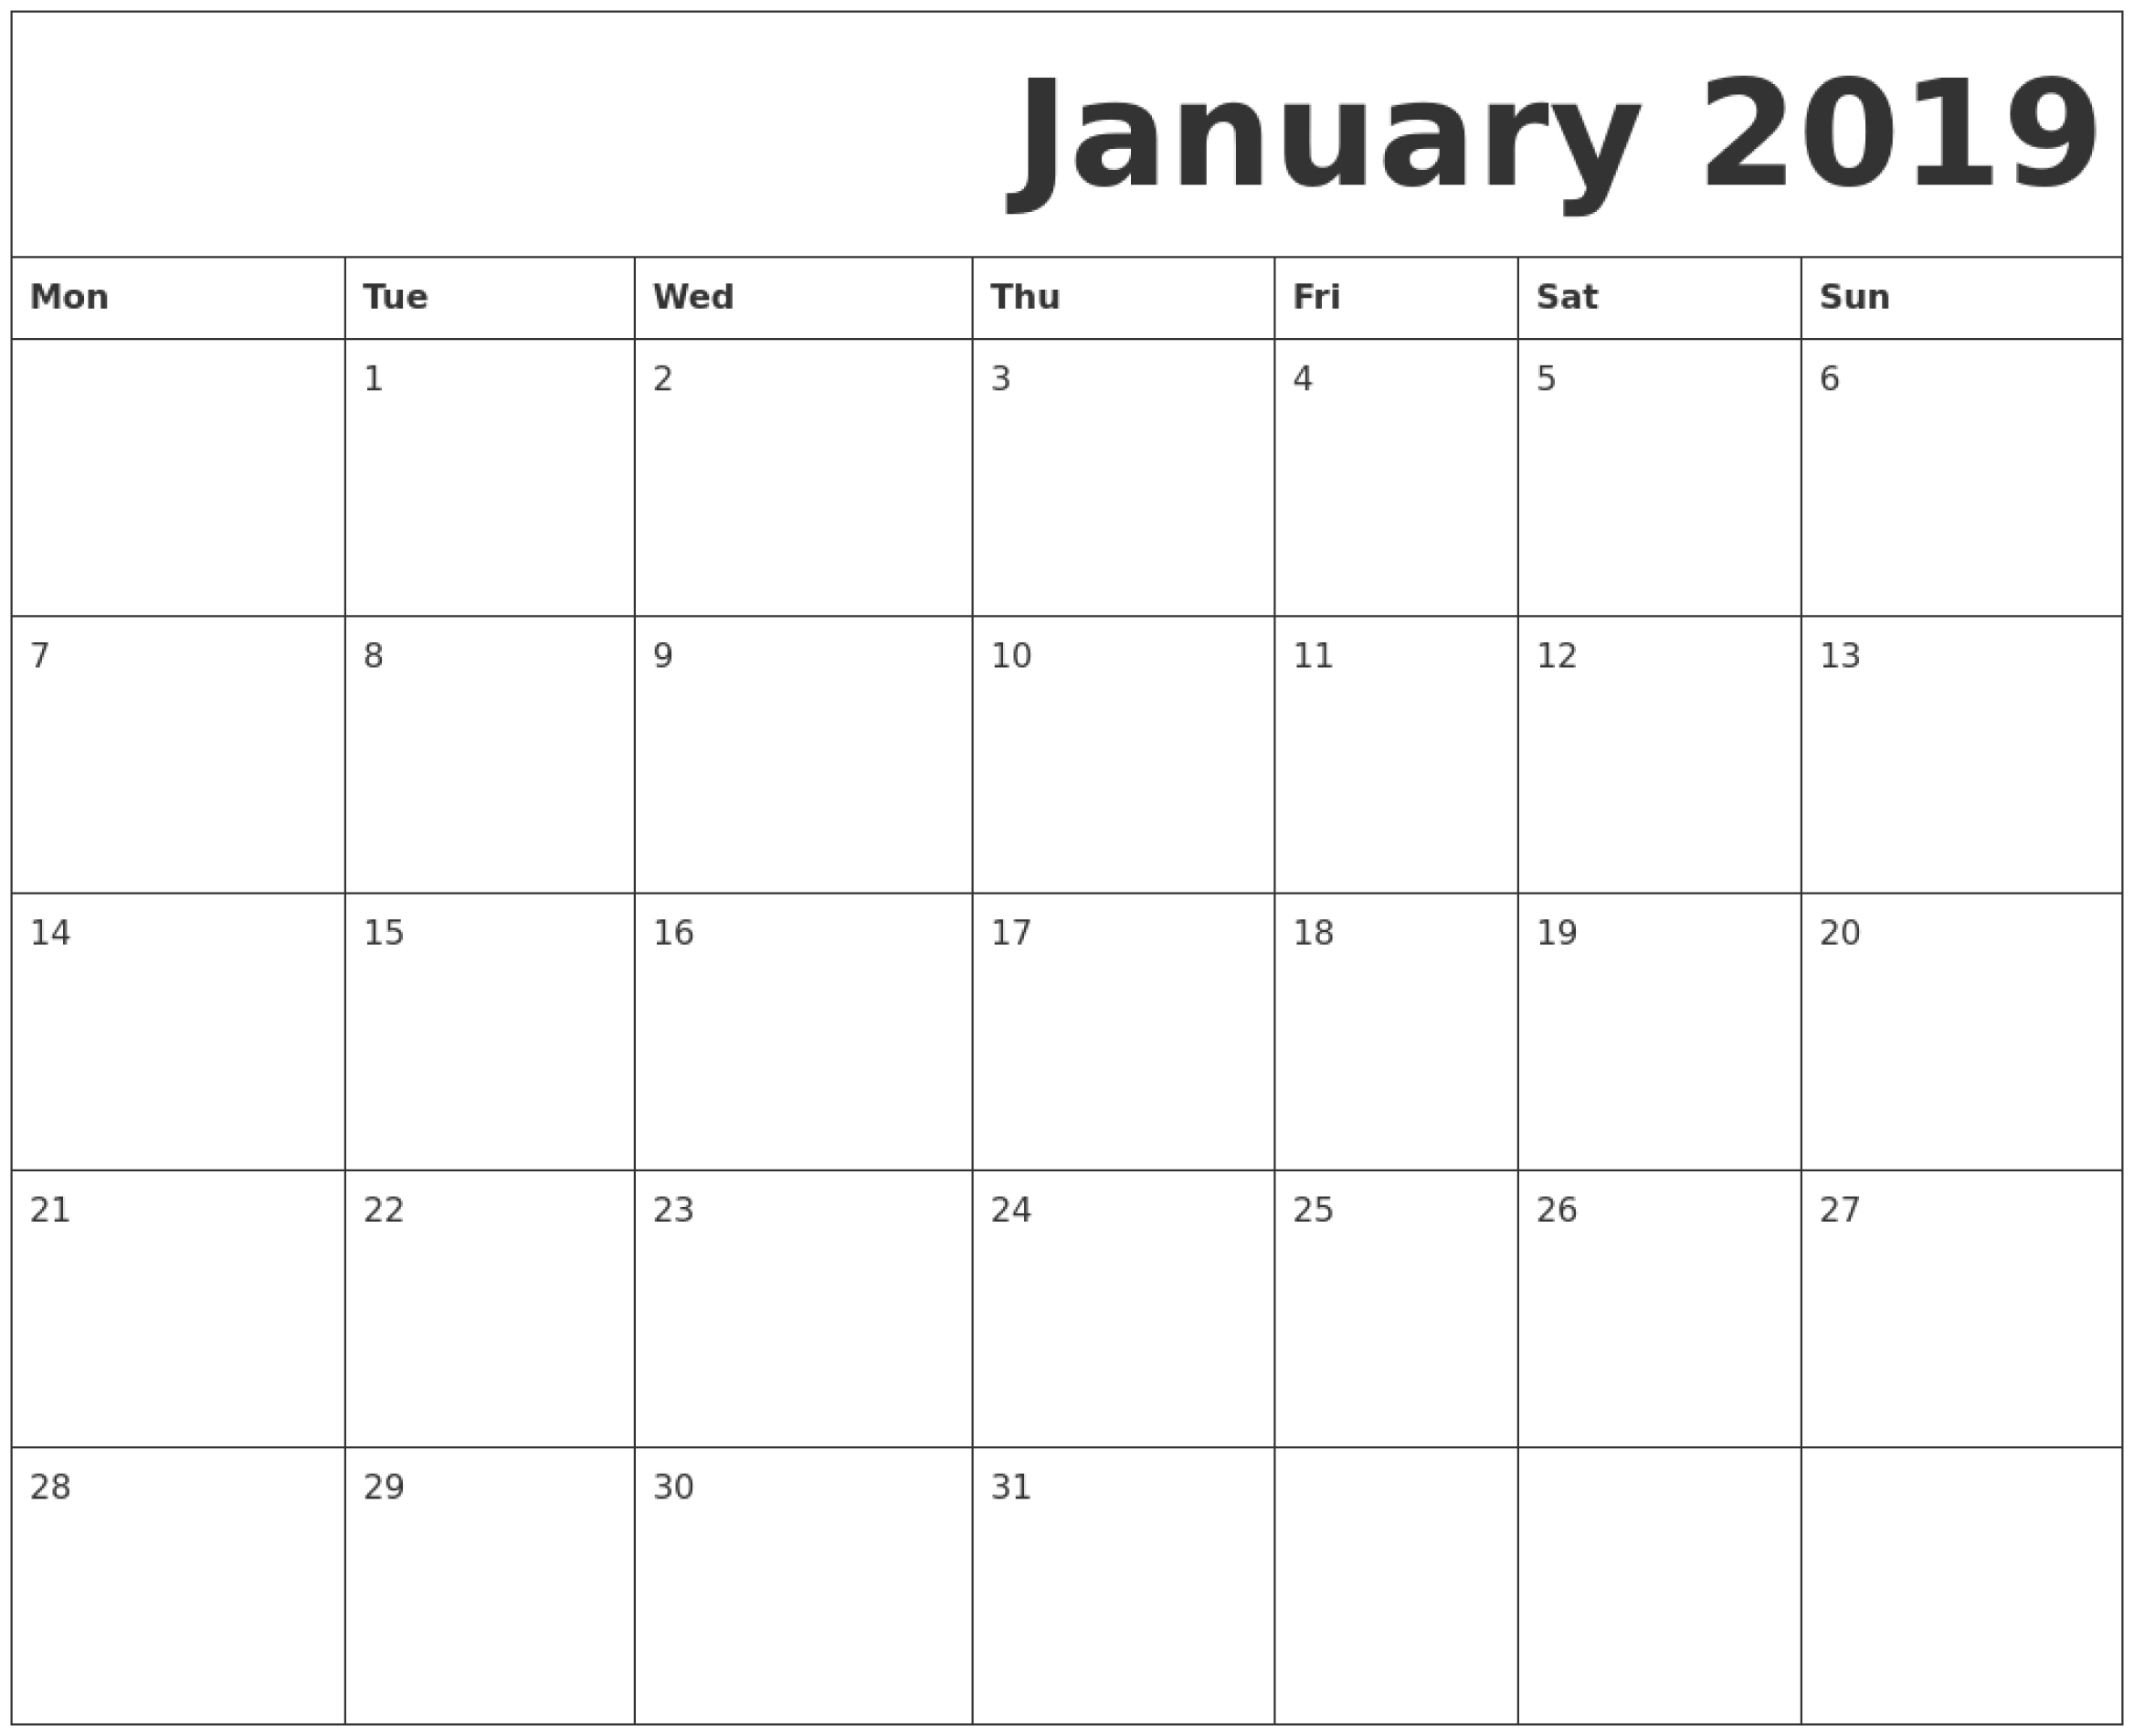 January 2019 Printable Calendar Monday Start. | January 2019-Calendar Template Monday Start